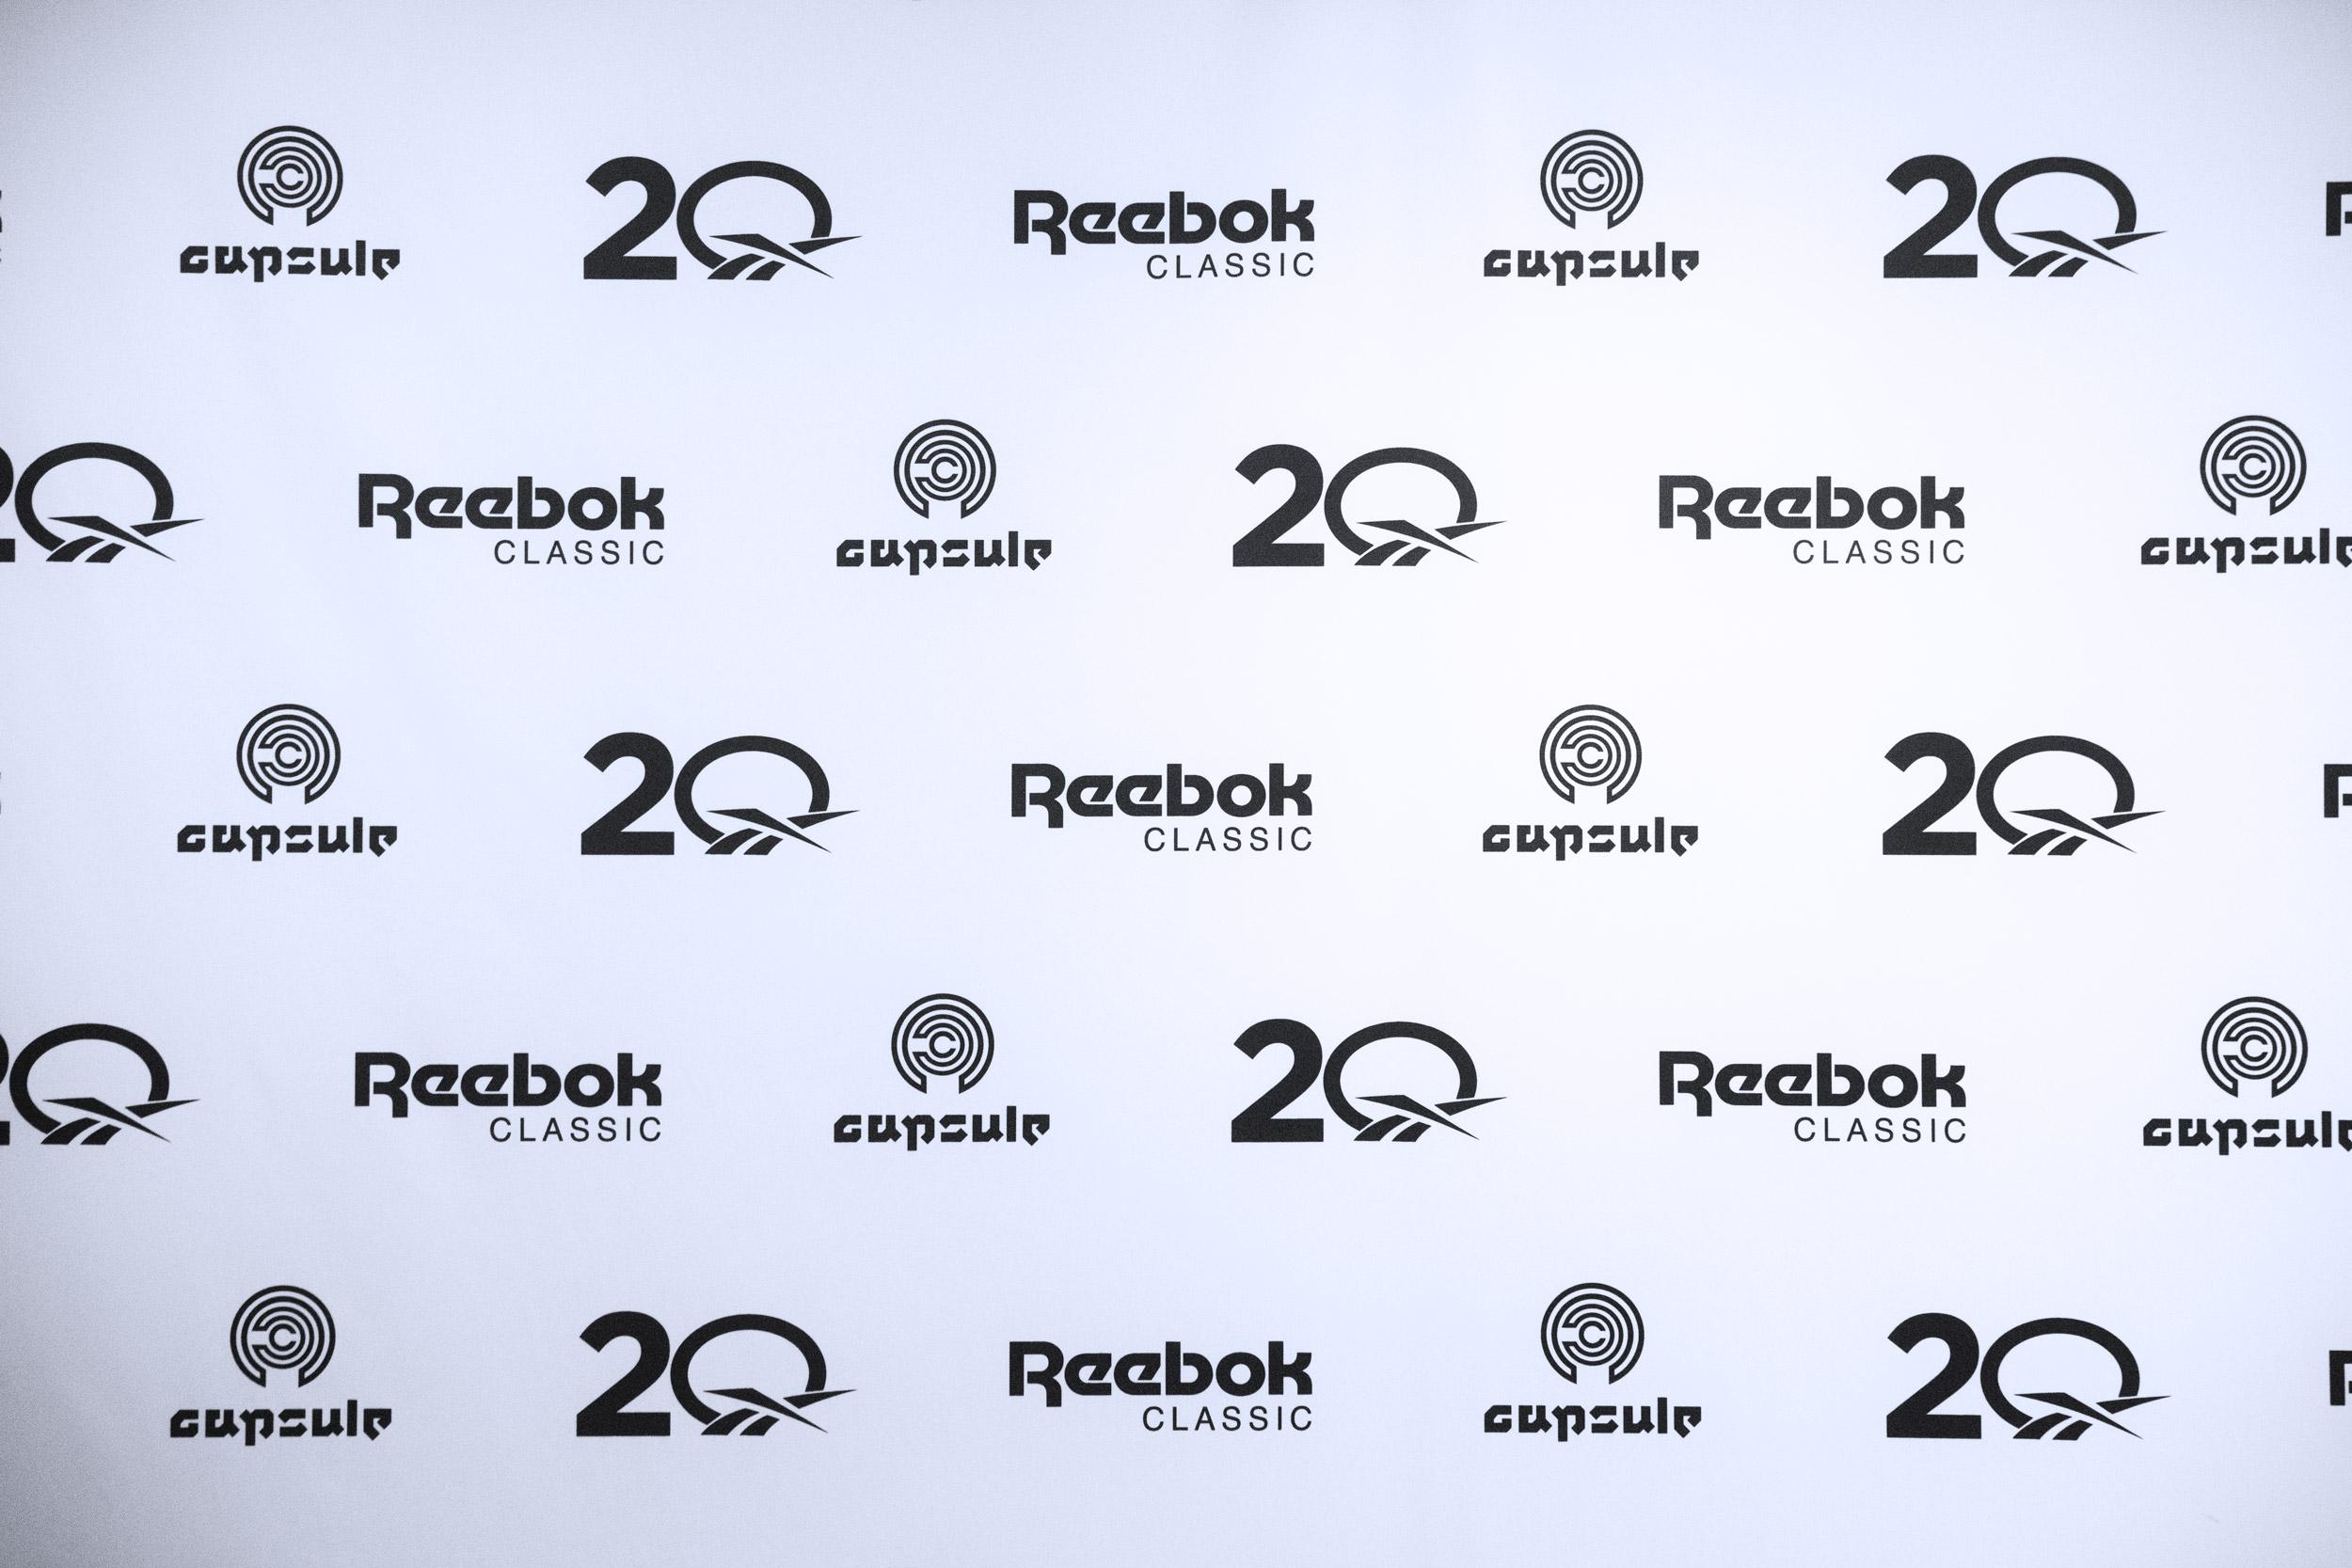 Reebok-x-Capsule-Event-10.jpg